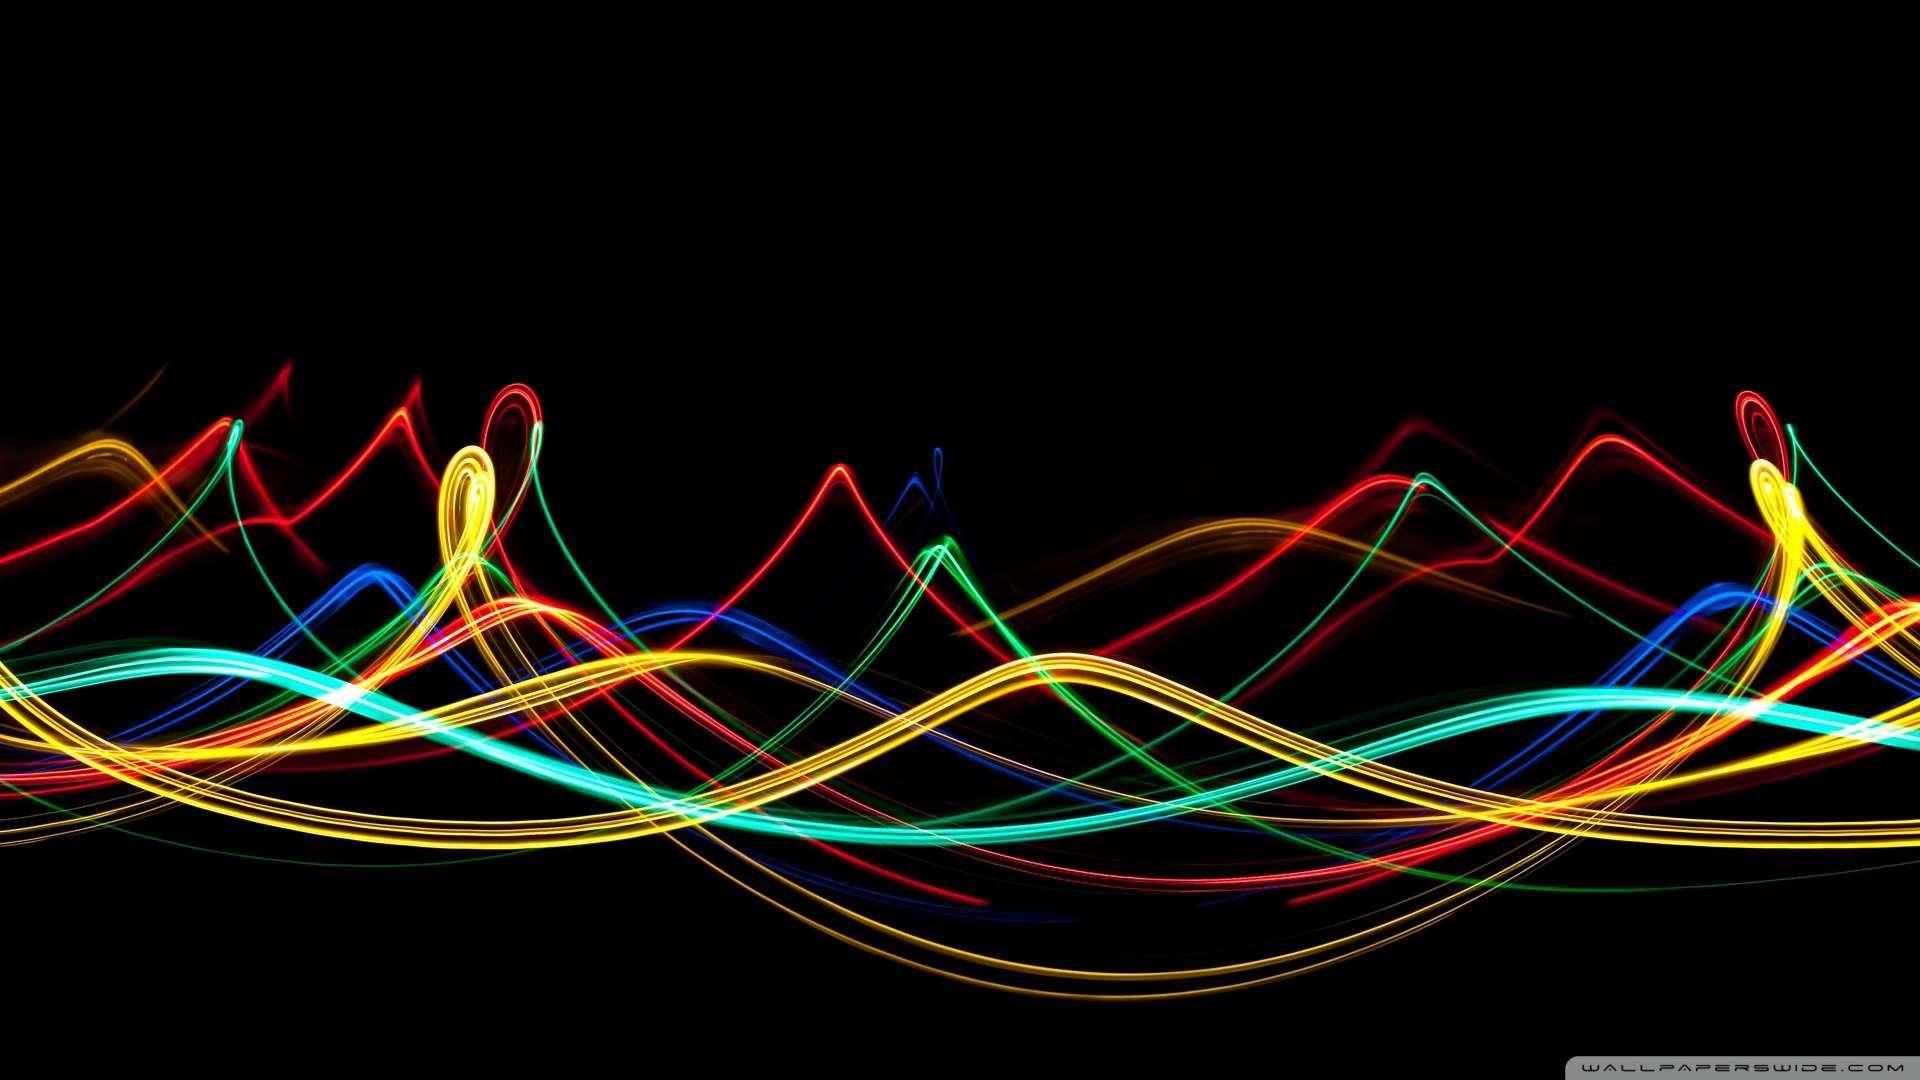 Download now Neon Waves Wallpaper 1080p HD Read description infos 1920x1080